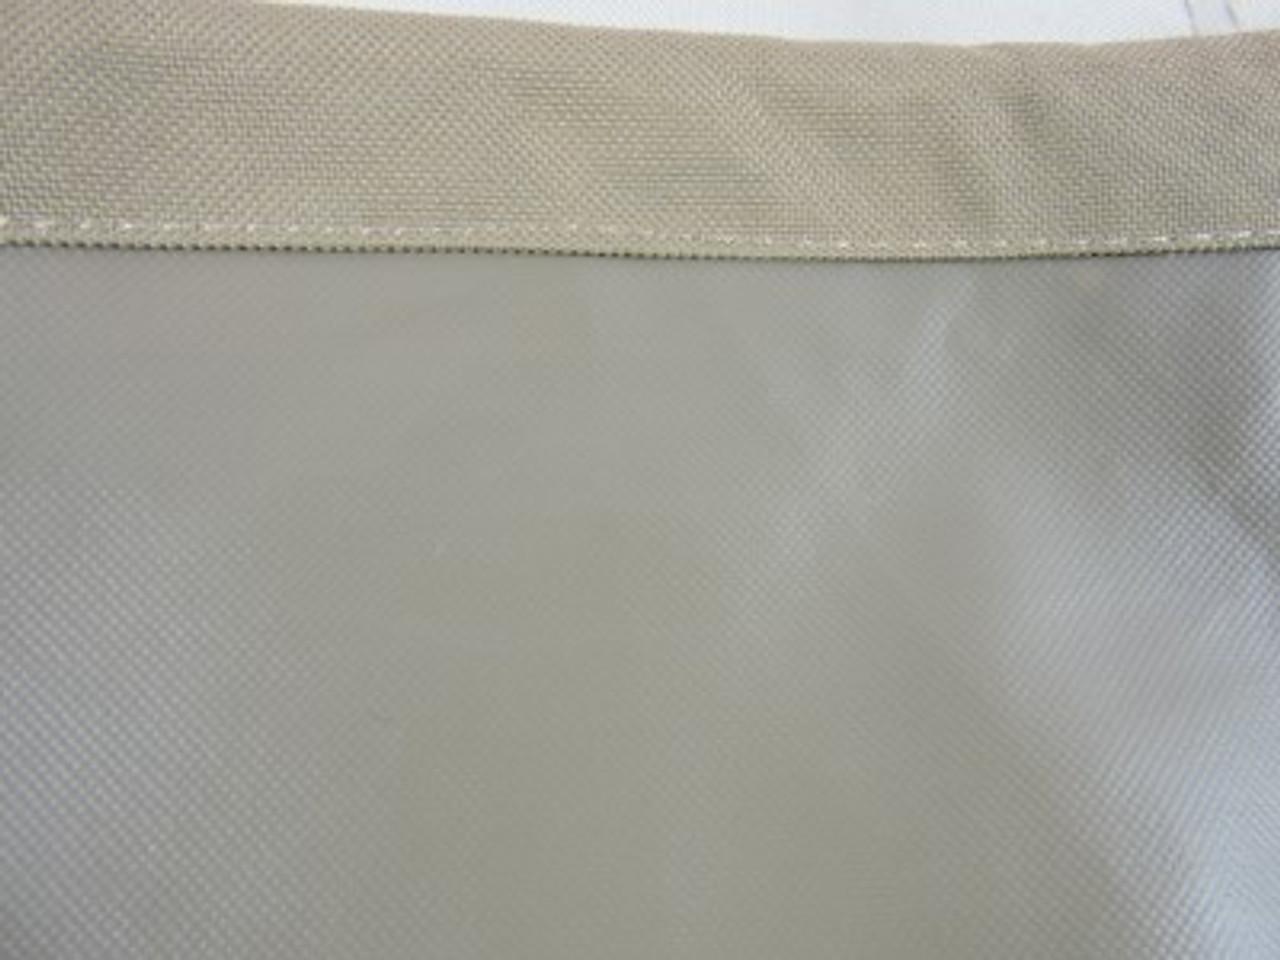 Dining Set Cover, Tapered Rectangle, XXLarge (152Lx90W) (Savanna #512111)